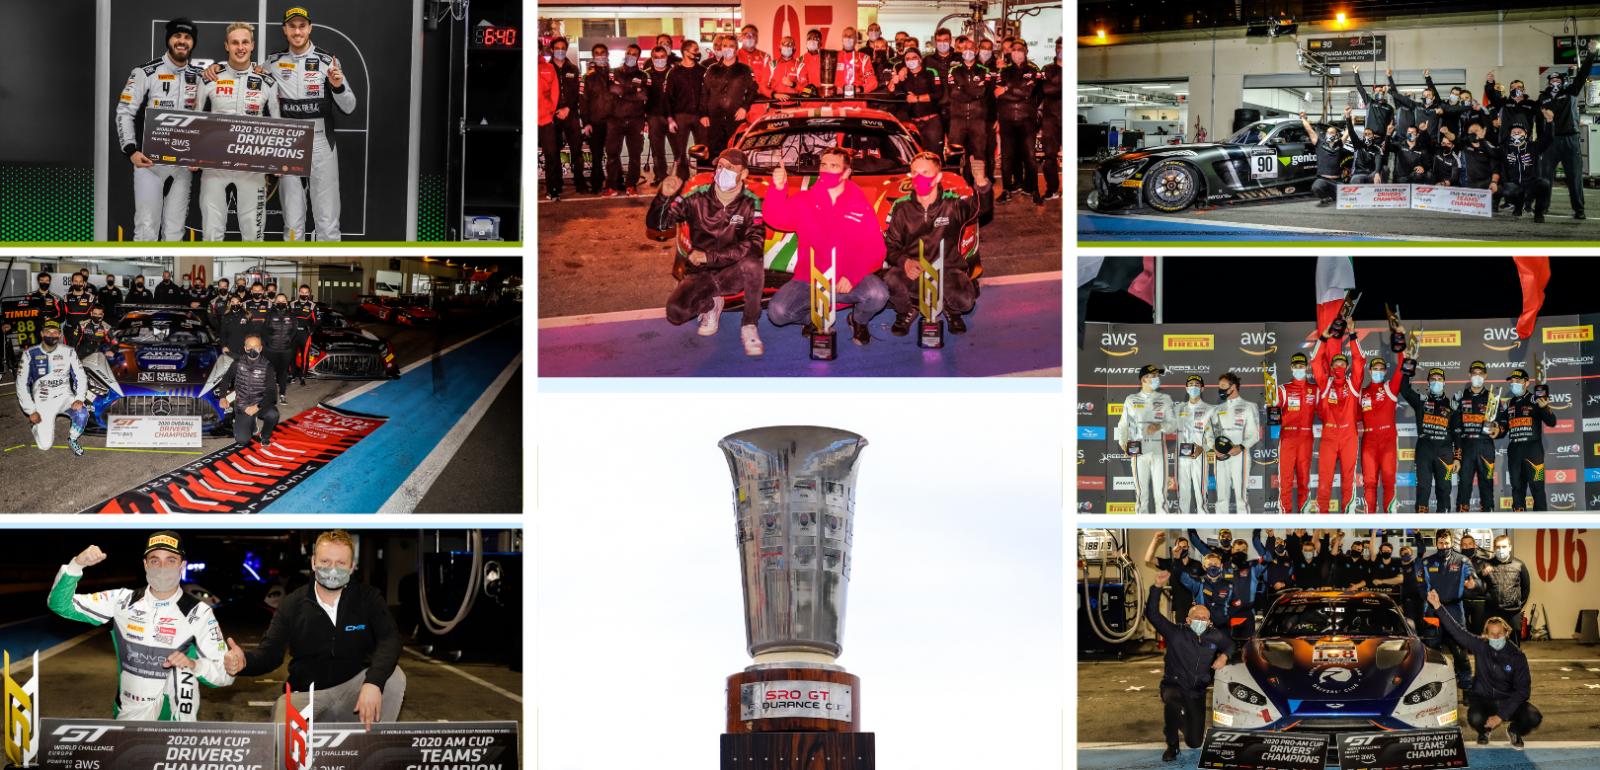 The Weekend Roundup: Circuit Paul Ricard 1000km